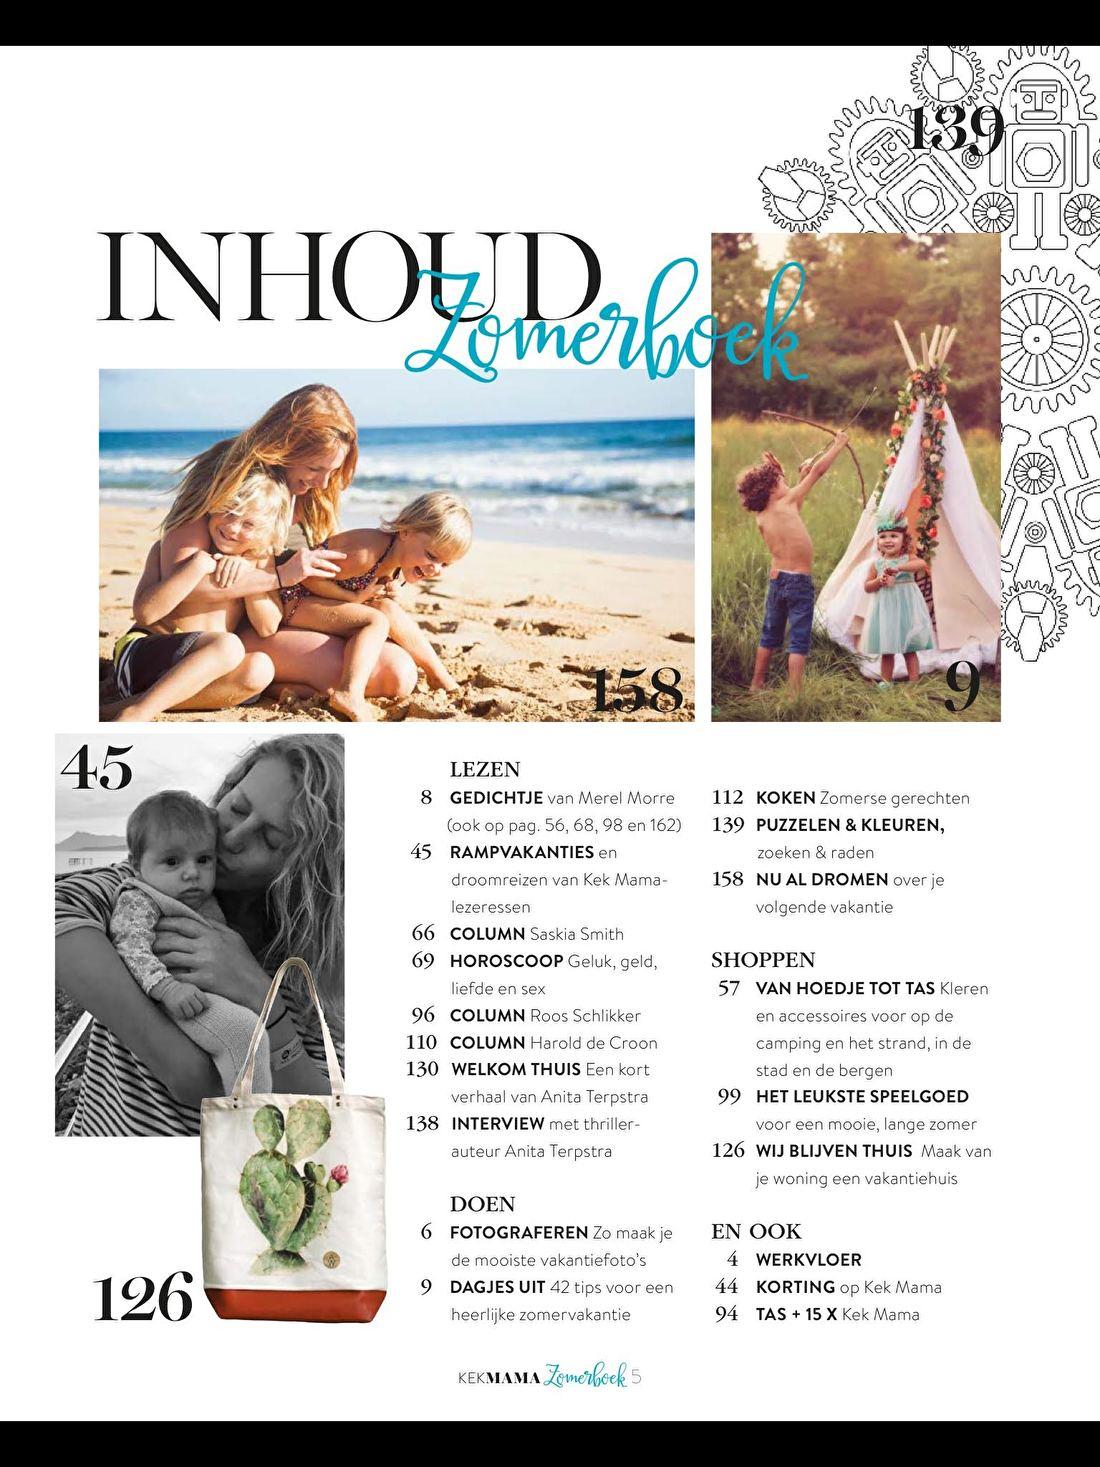 Publications Annet Weelink Design